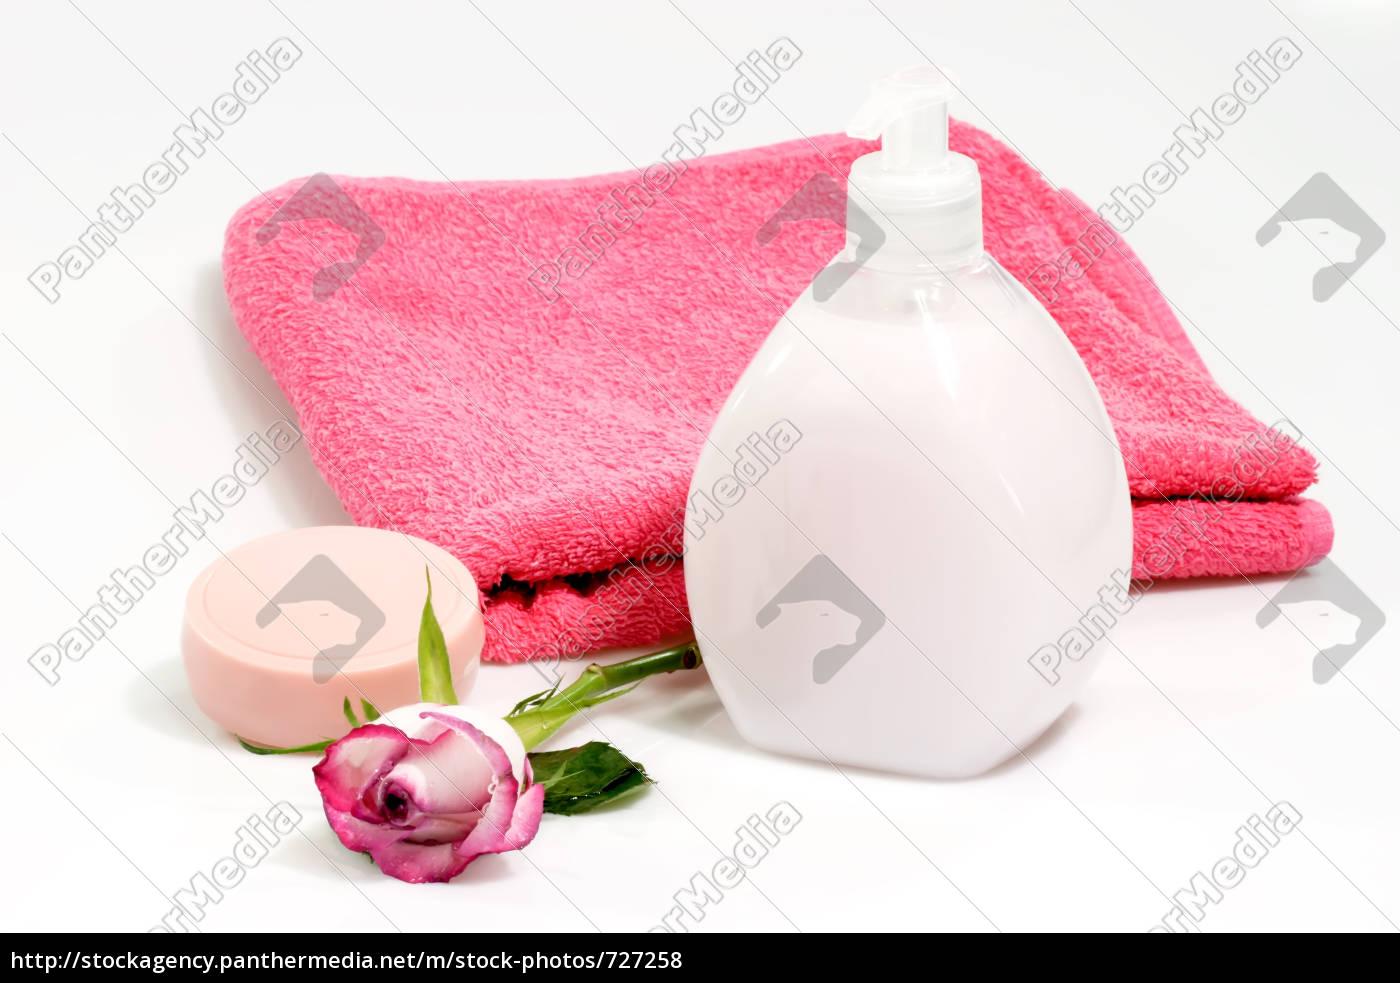 rose, water - 727258